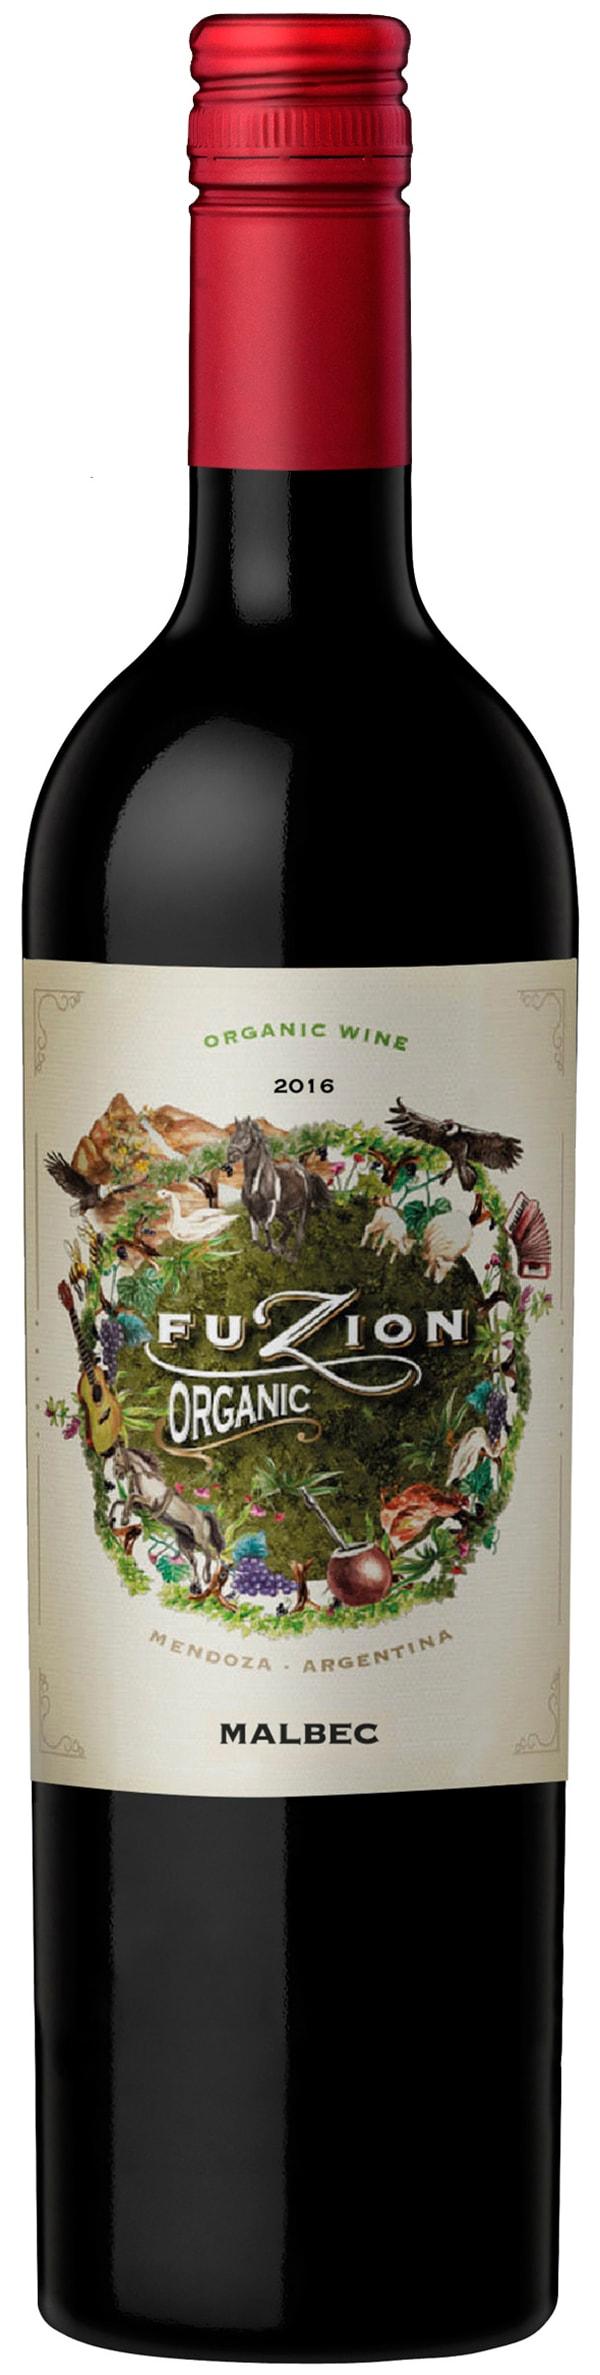 Fuzion Organic Malbec 2018